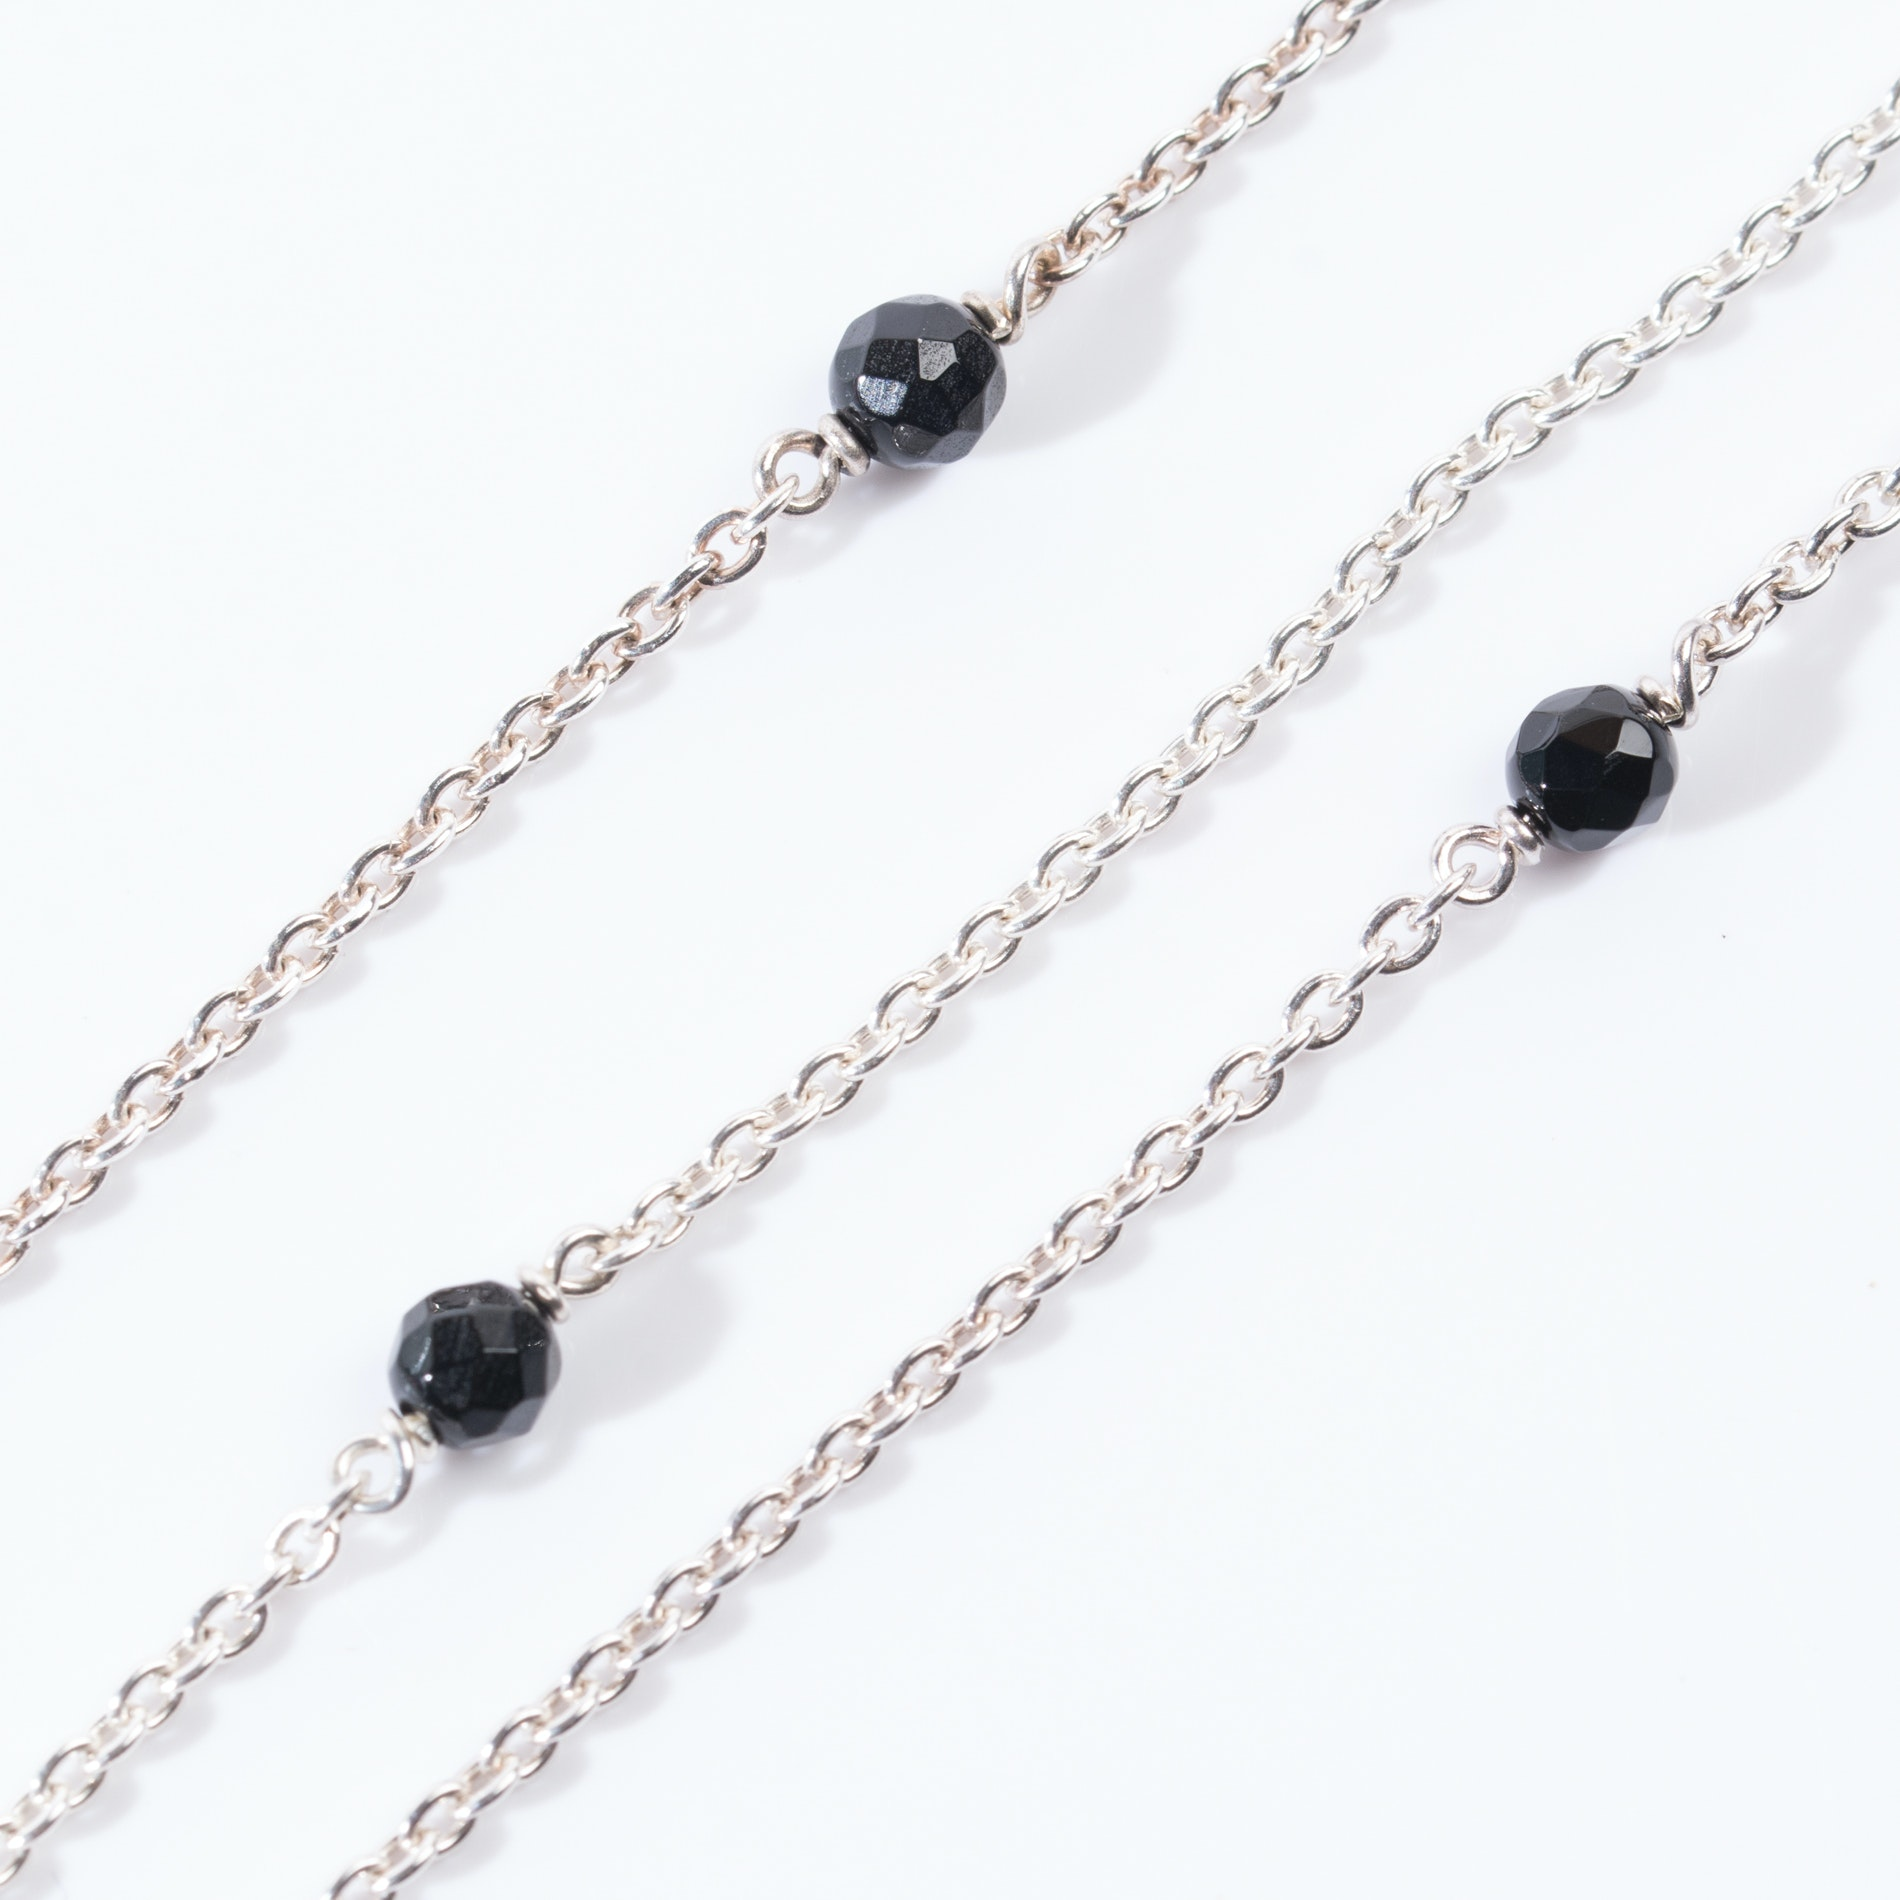 Pandora Sterling Silver Three-Strand Lariat Necklace